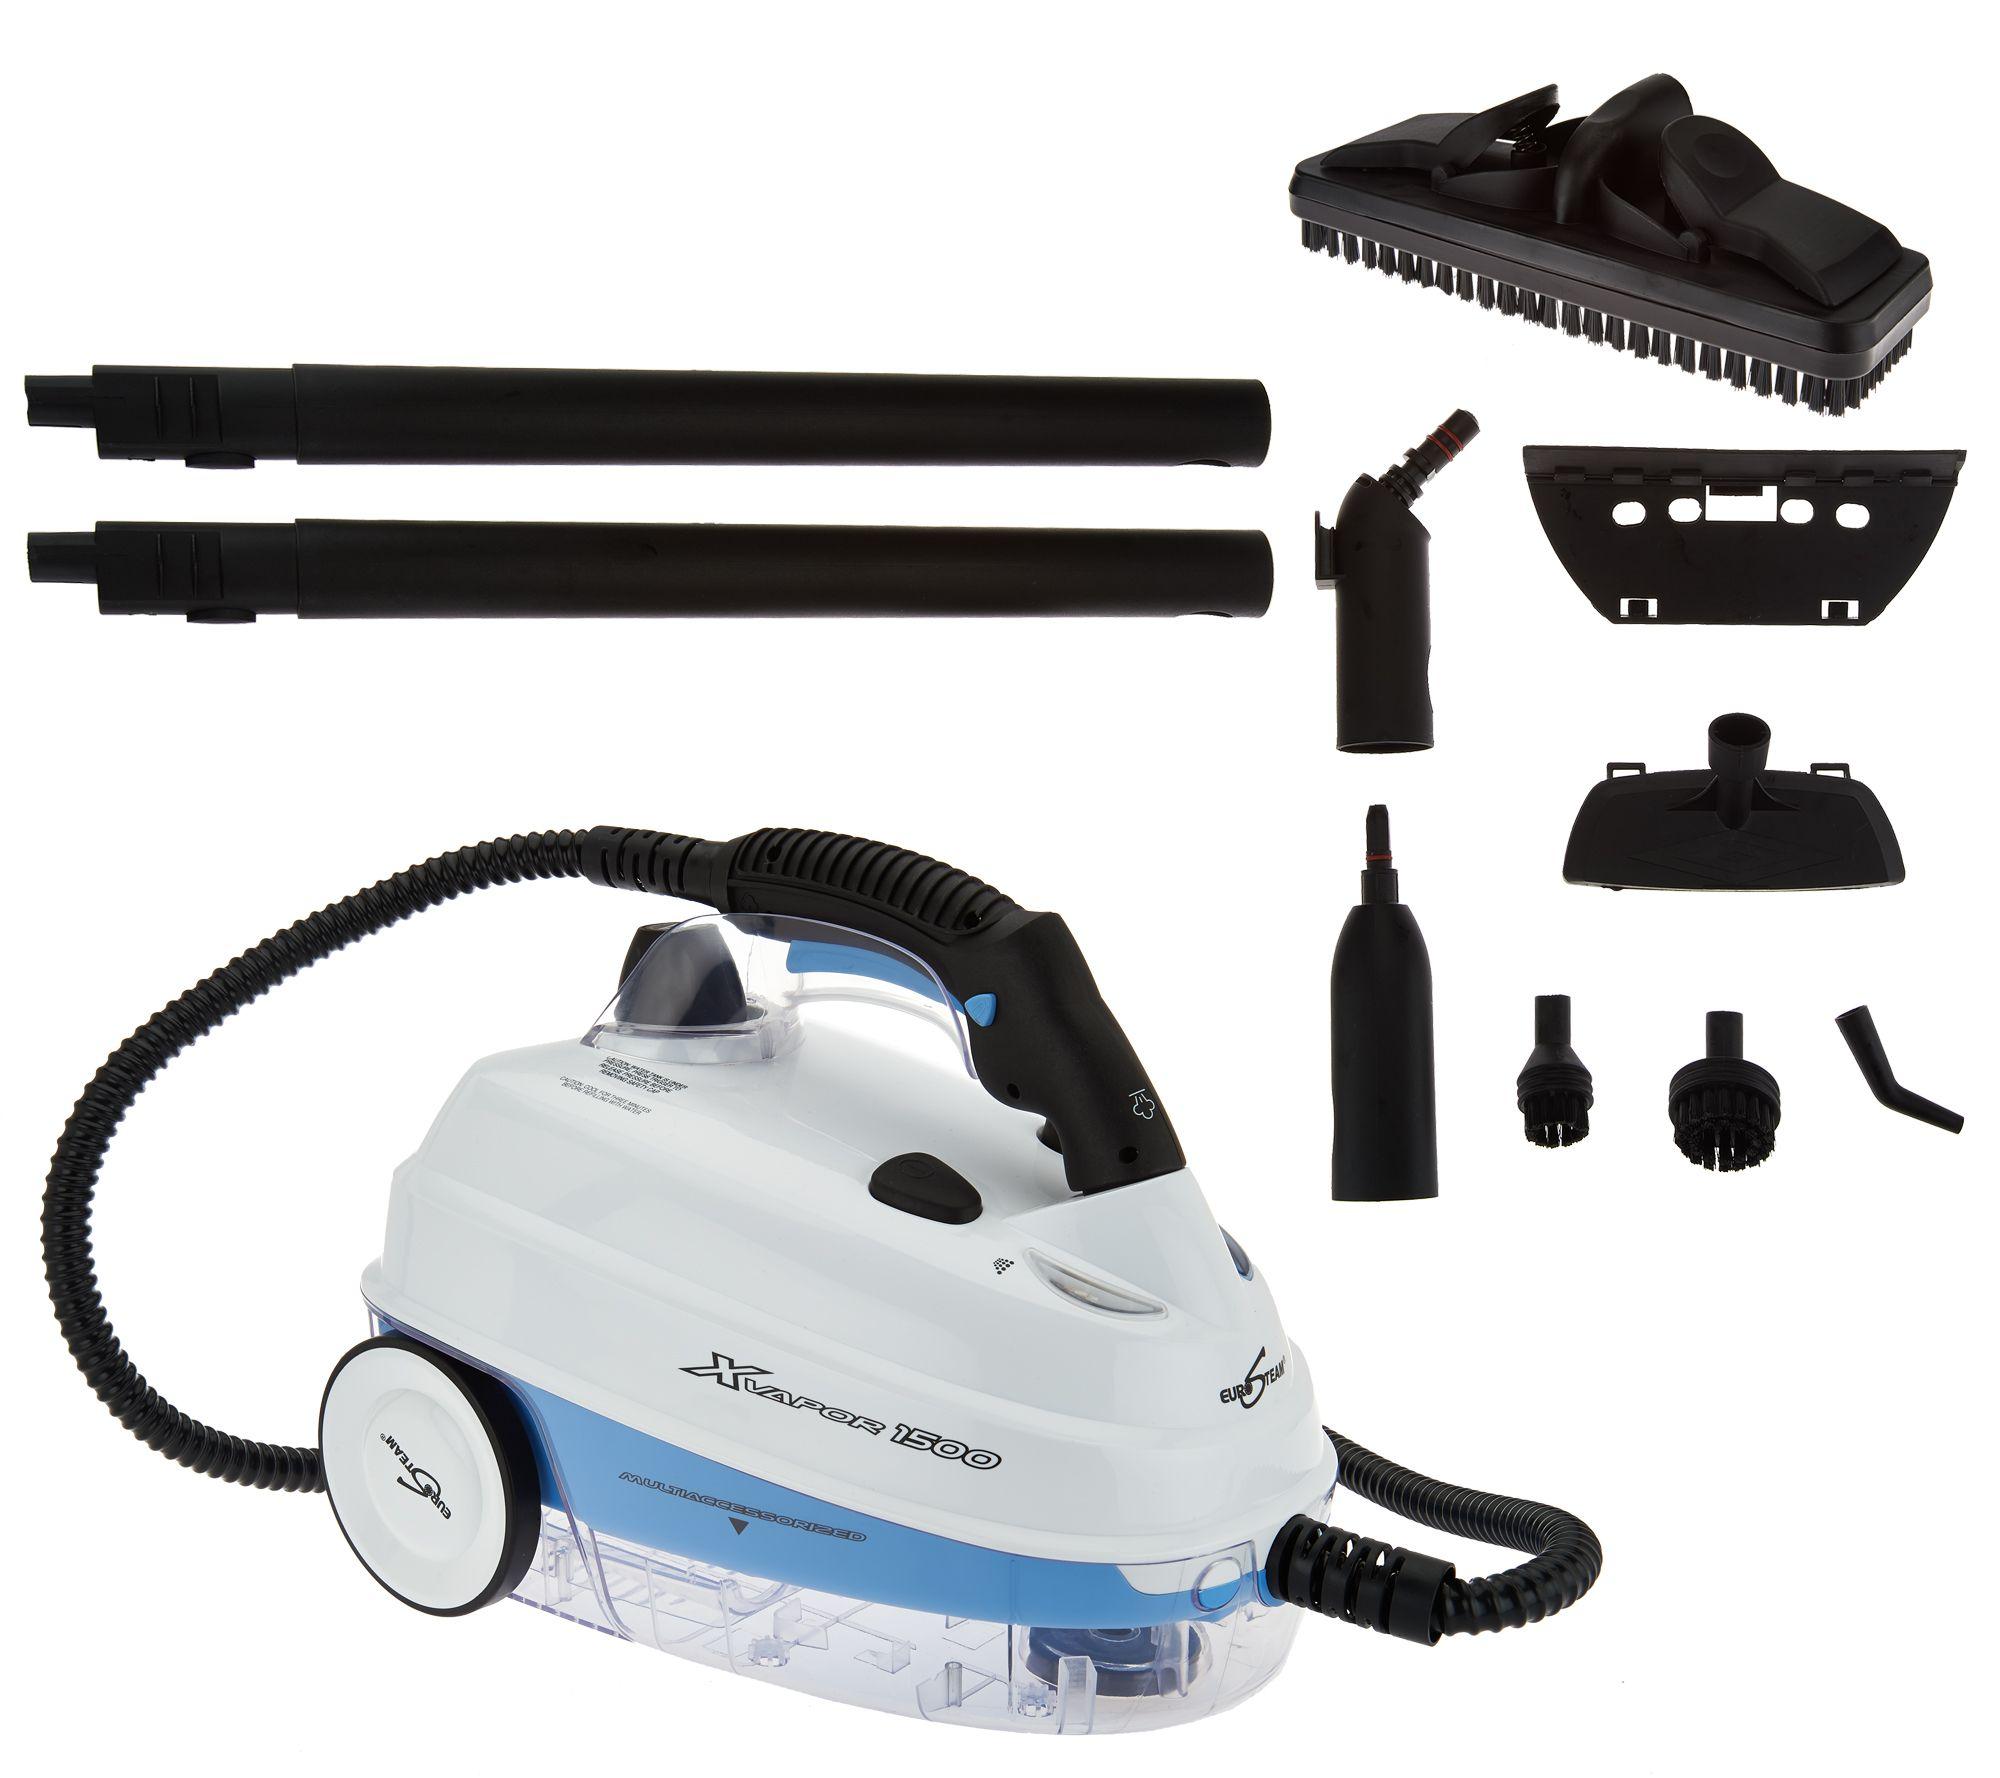 Eurosteam 1500 Watt Maximum Multi Steam Cleaner & Tools Page 1